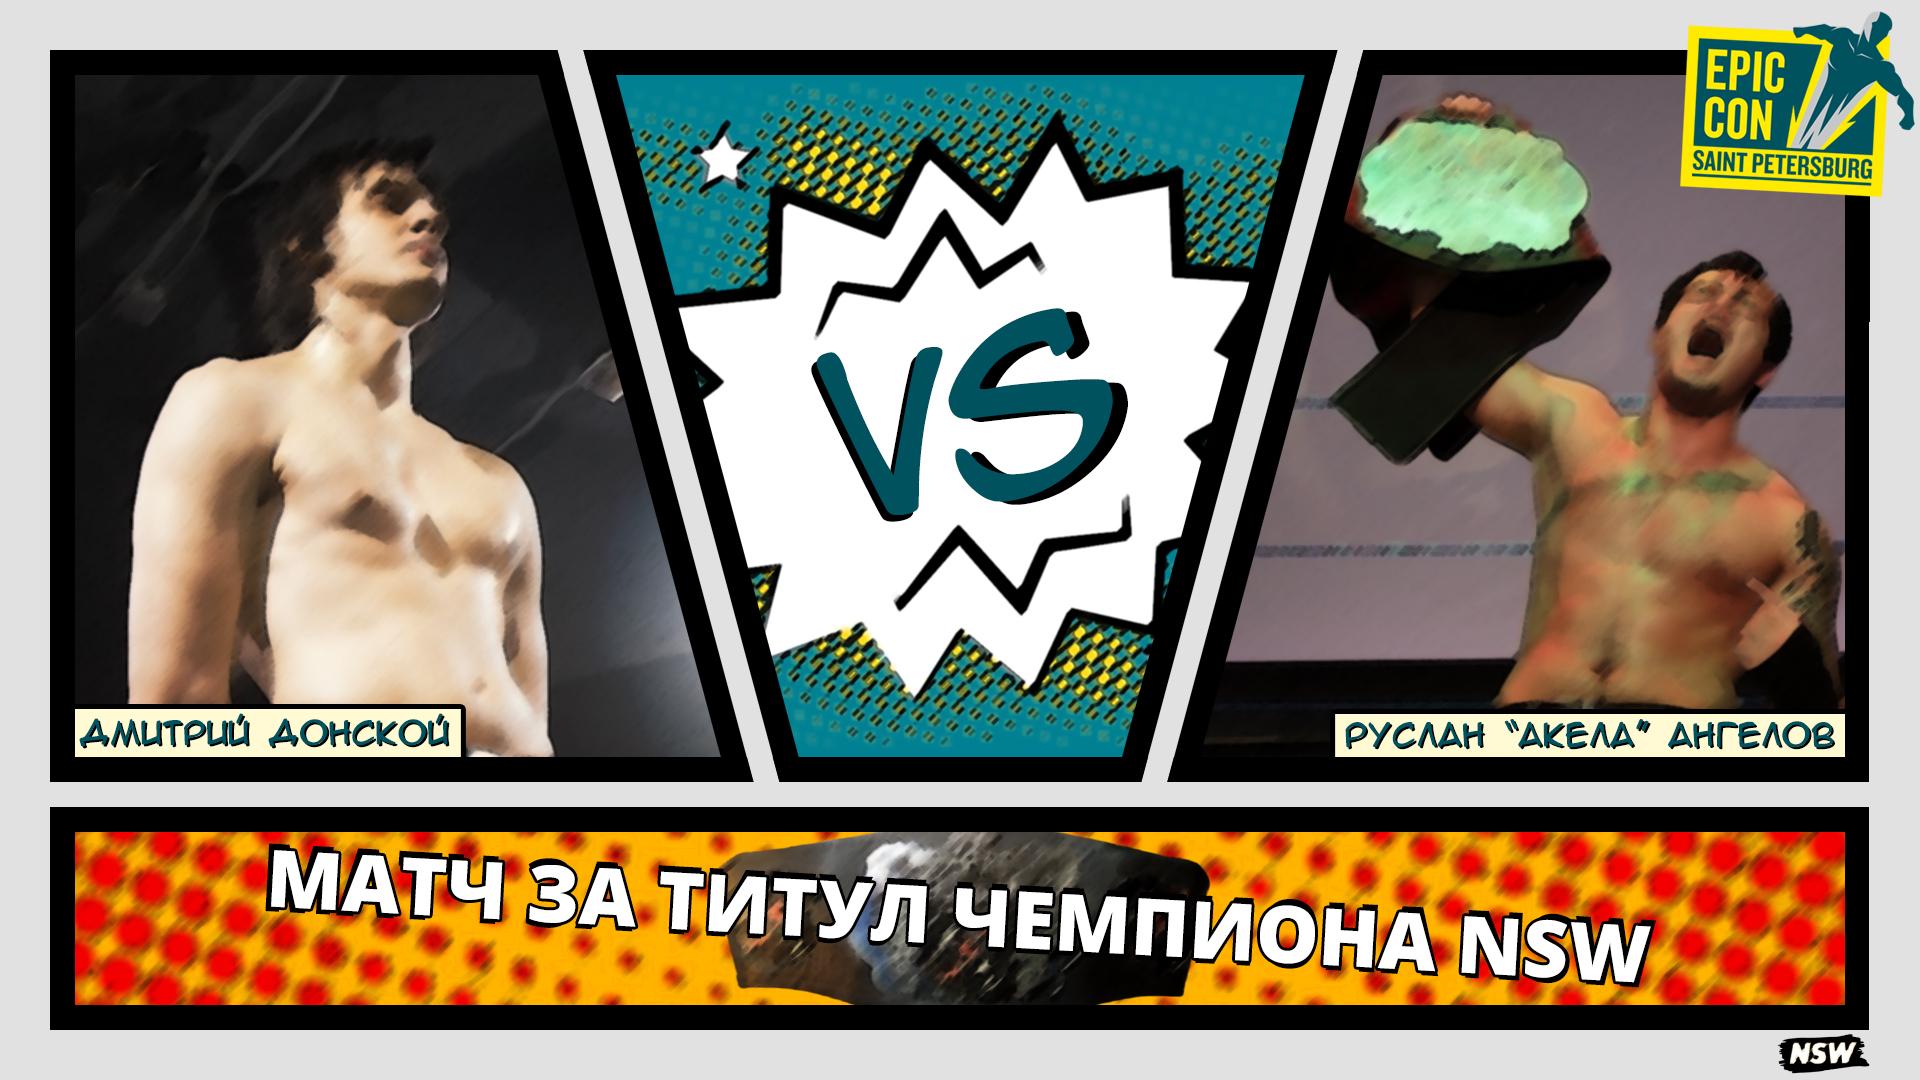 NSW Epic Con 2017: Руслан 'Акела' Ангелов против Дмитрия Донского